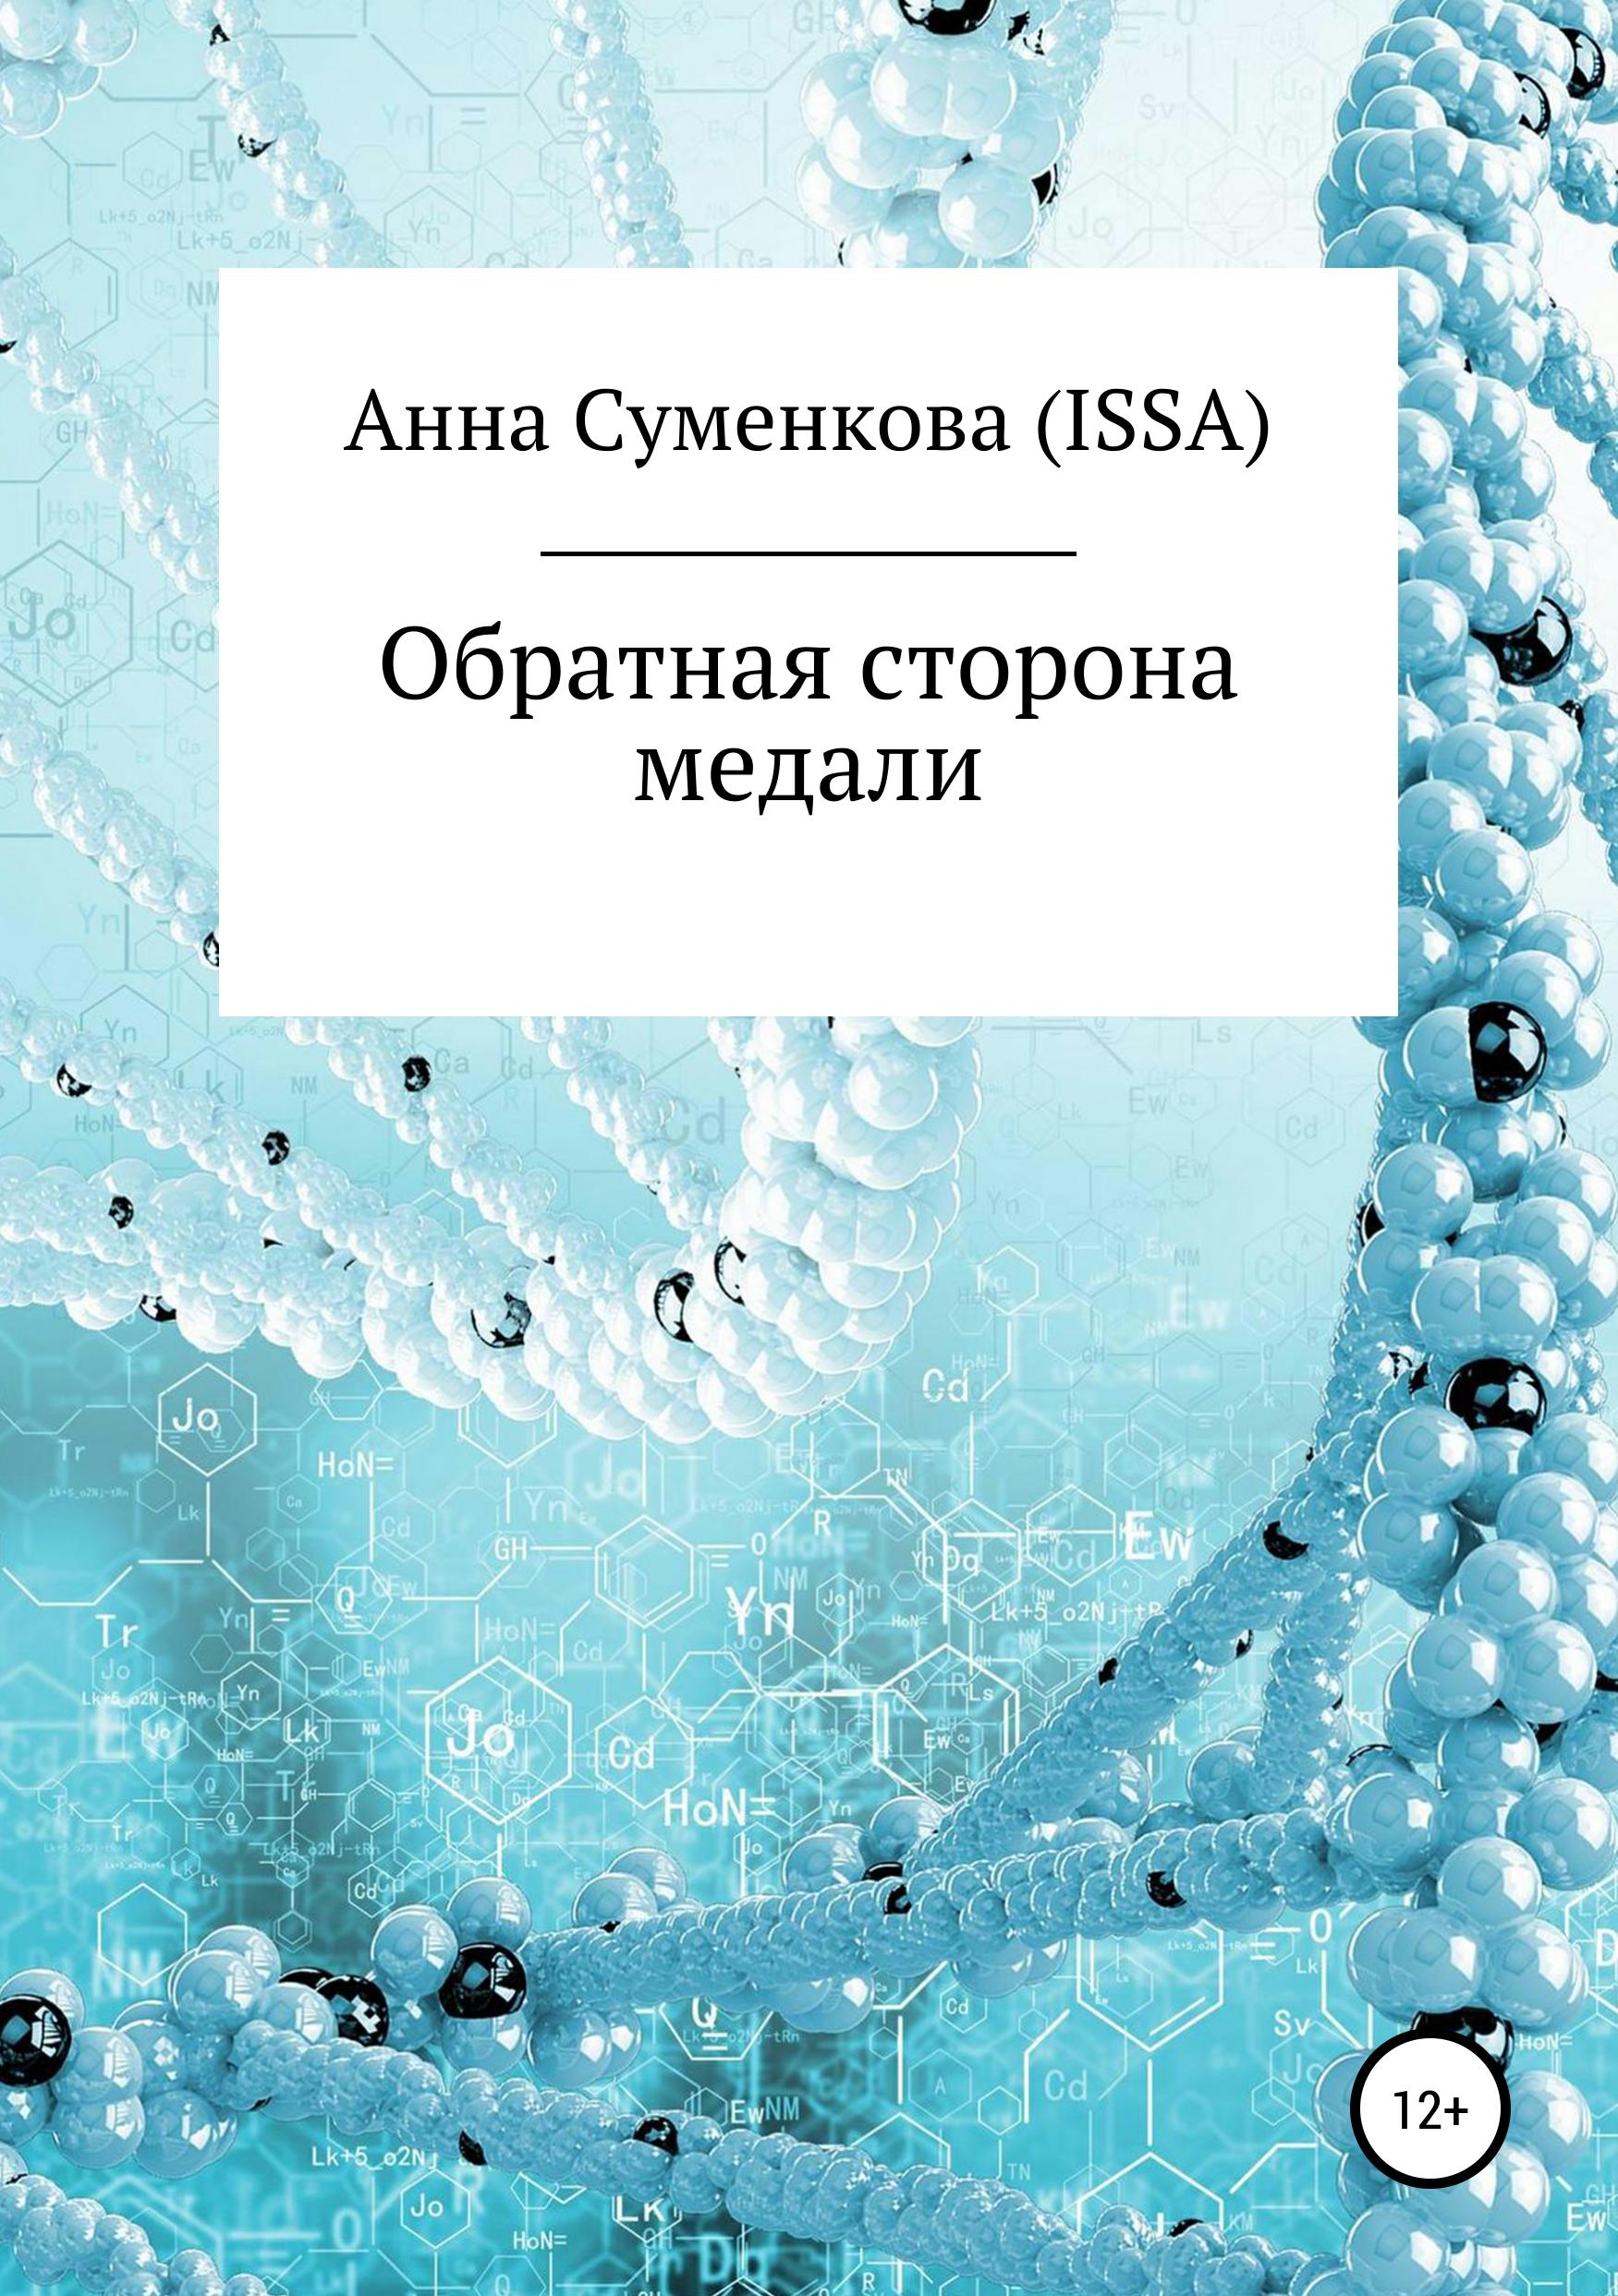 Анна Евгеньевна Суменкова (ISSA) Обратная сторона медали цена 2017